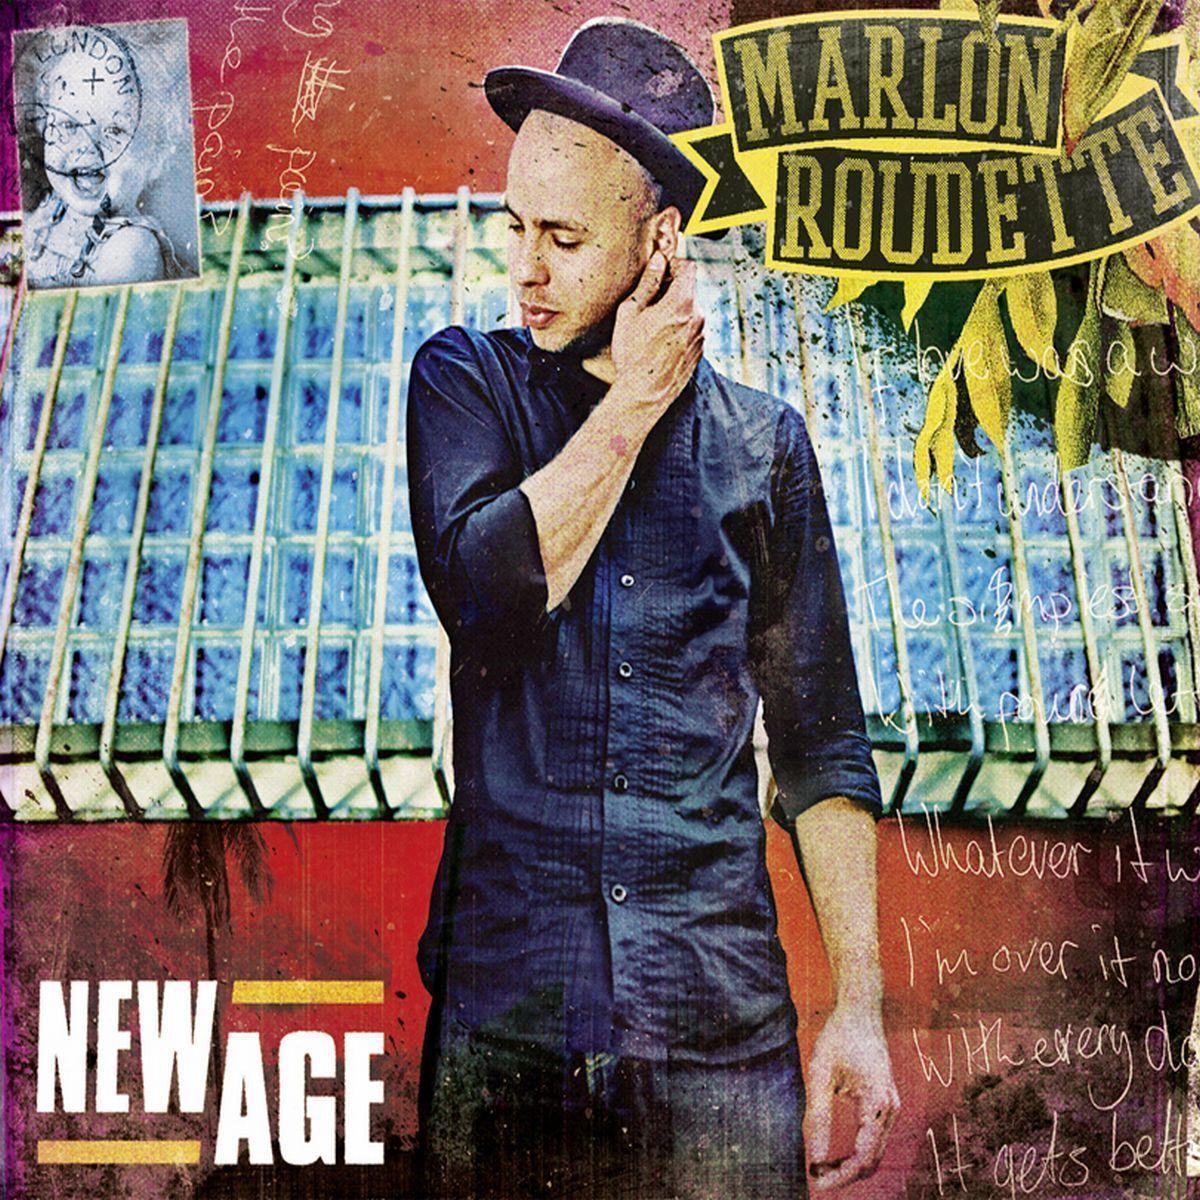 Cover: New age, Marlon Roudette